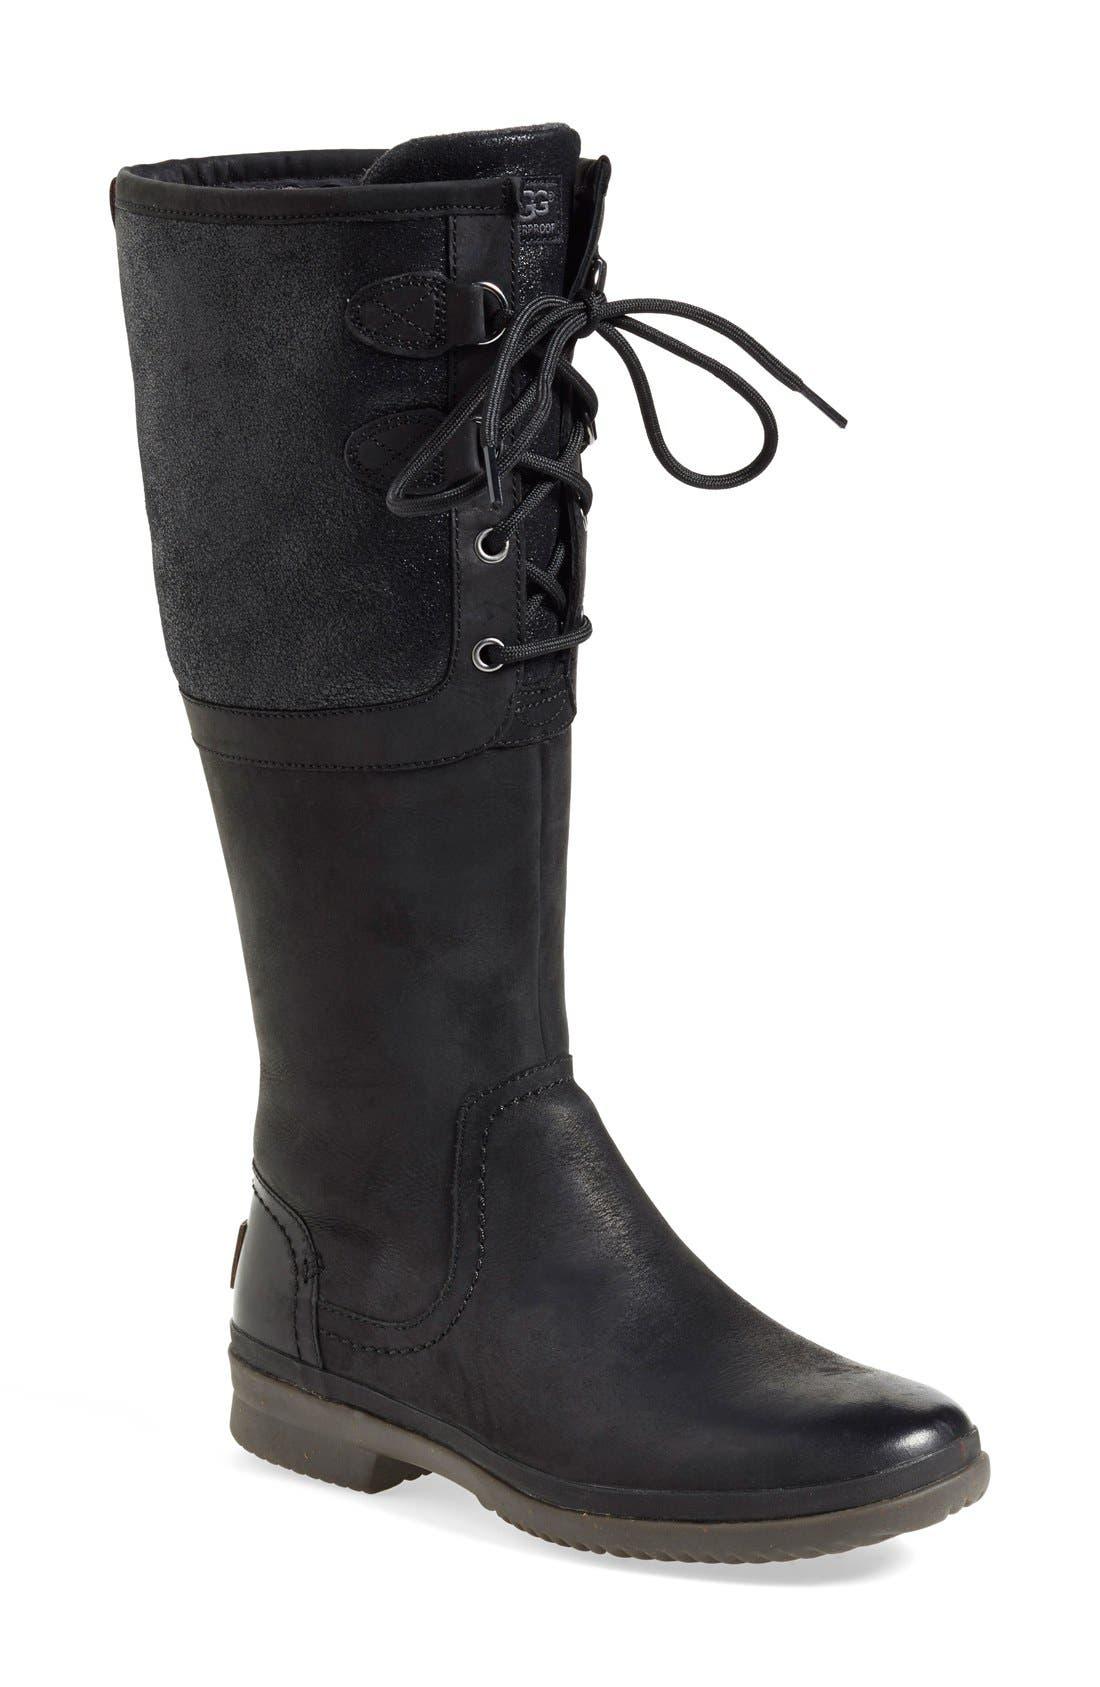 Main Image - UGG® 'Elsa' Waterproof Boot (Women)